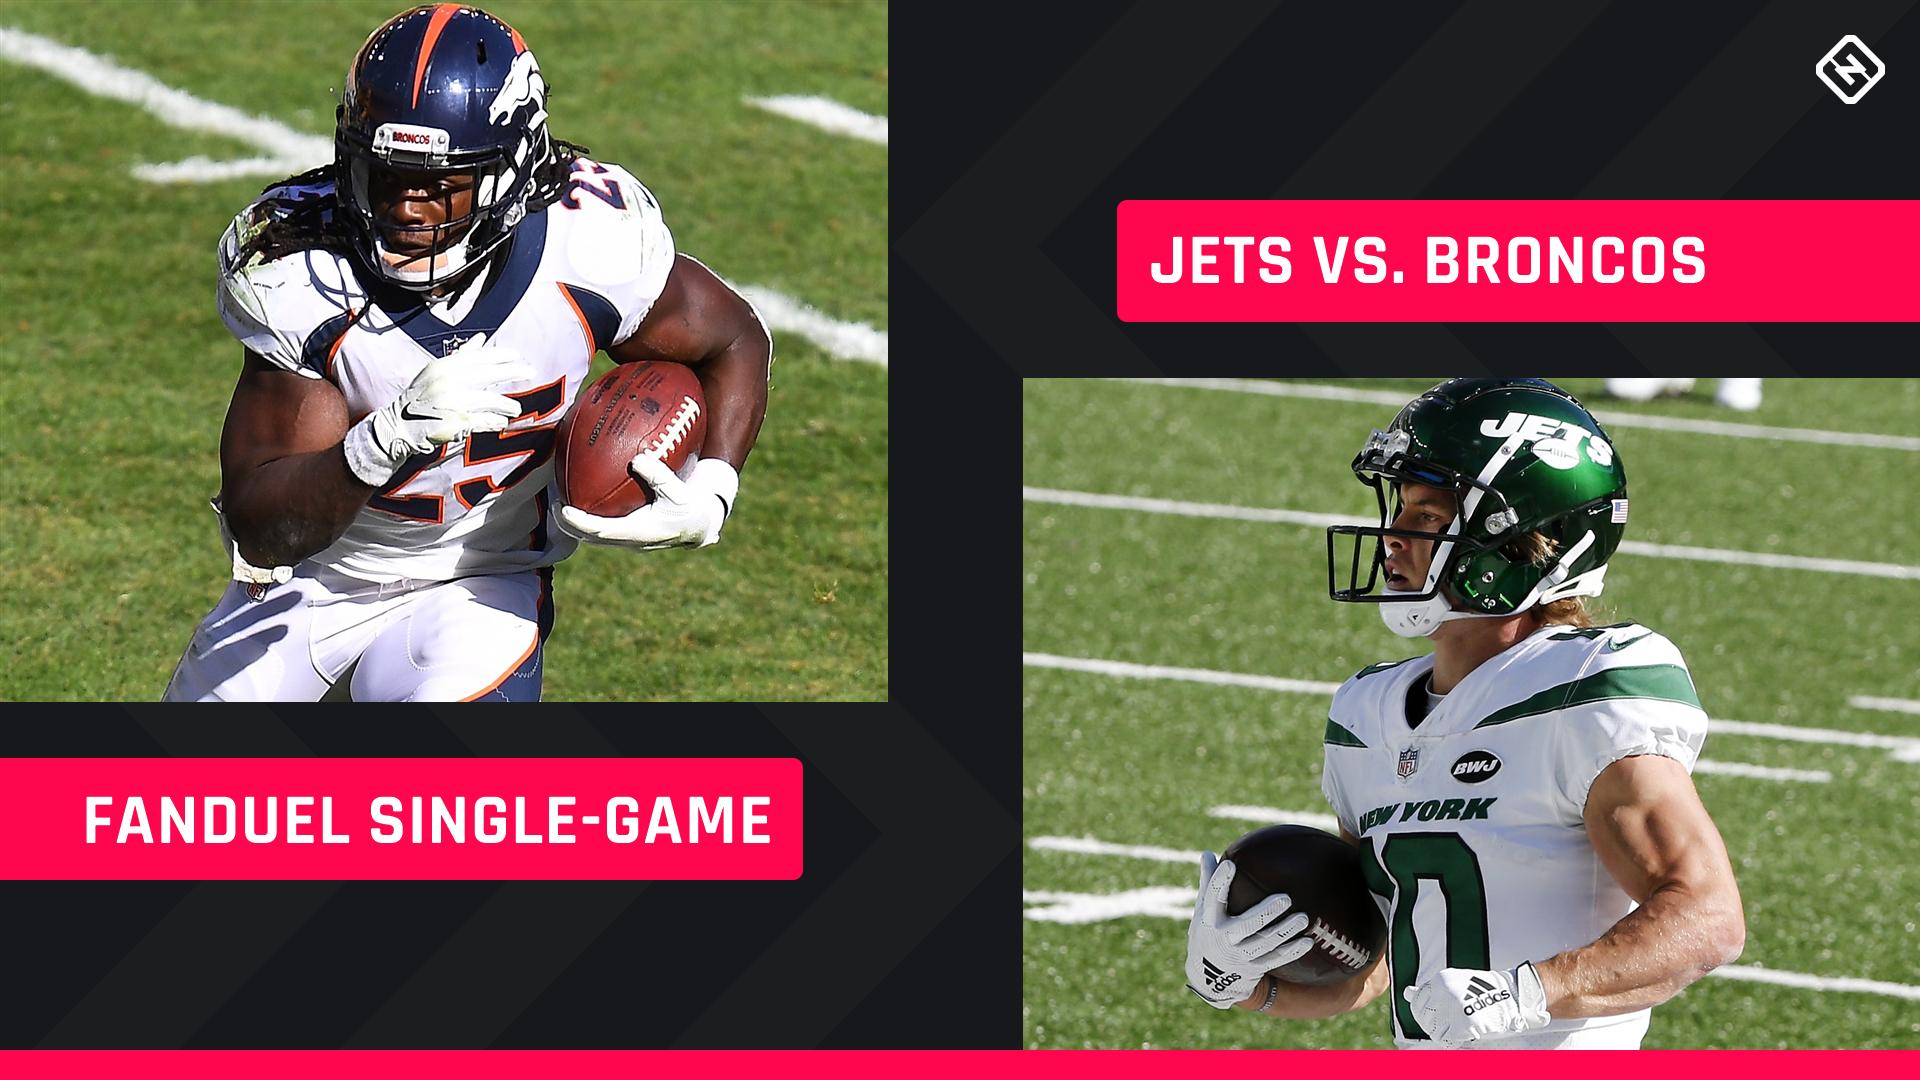 Thursday Night Football FanDuel Picks: NFL DFS lineup advice for Week 4 Jets-Broncos single-game tournaments